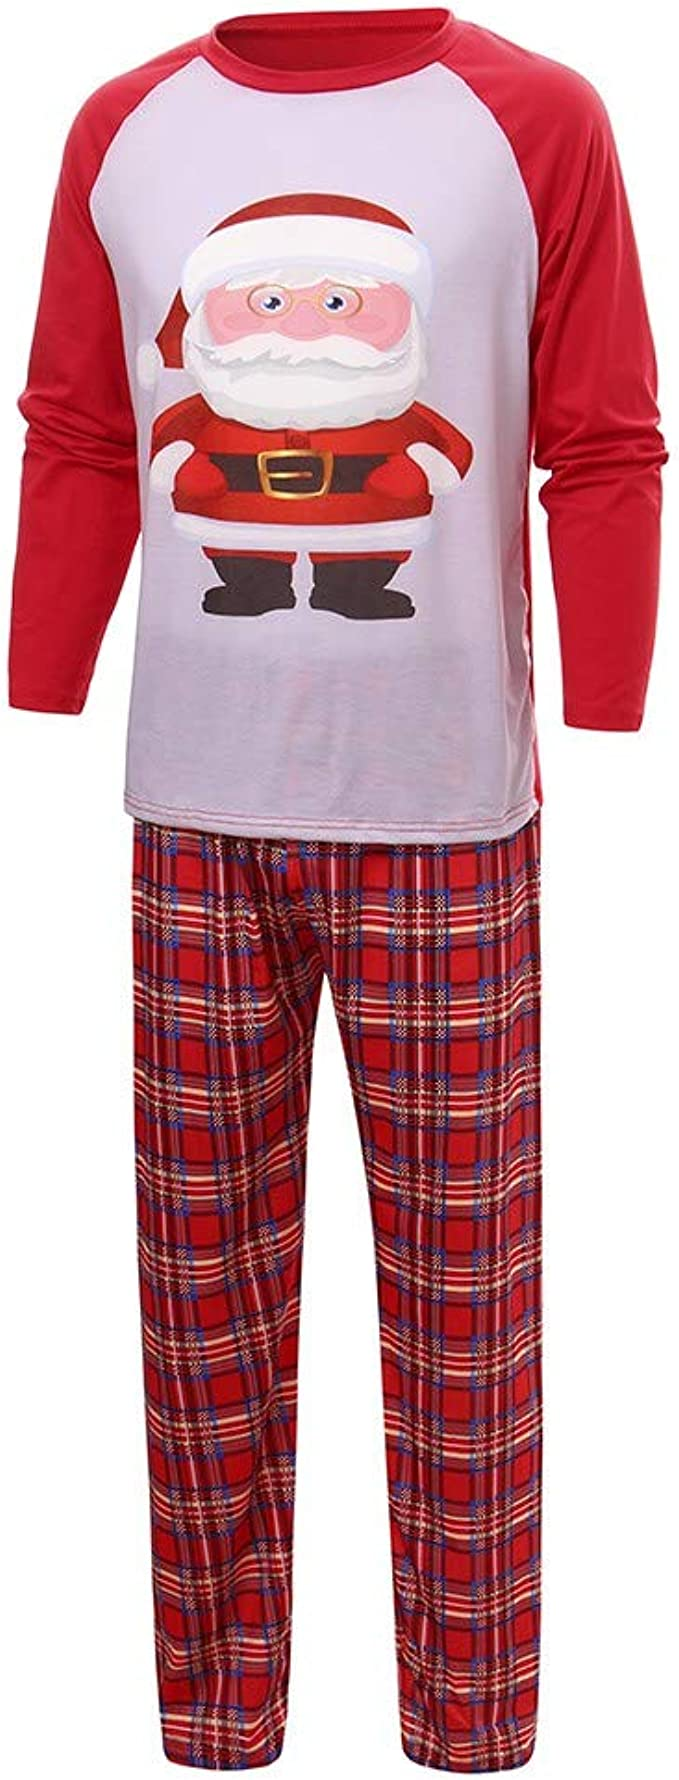 Trisee Conjunto de Pijama Navidad Familia, Camiseta Estampada ...